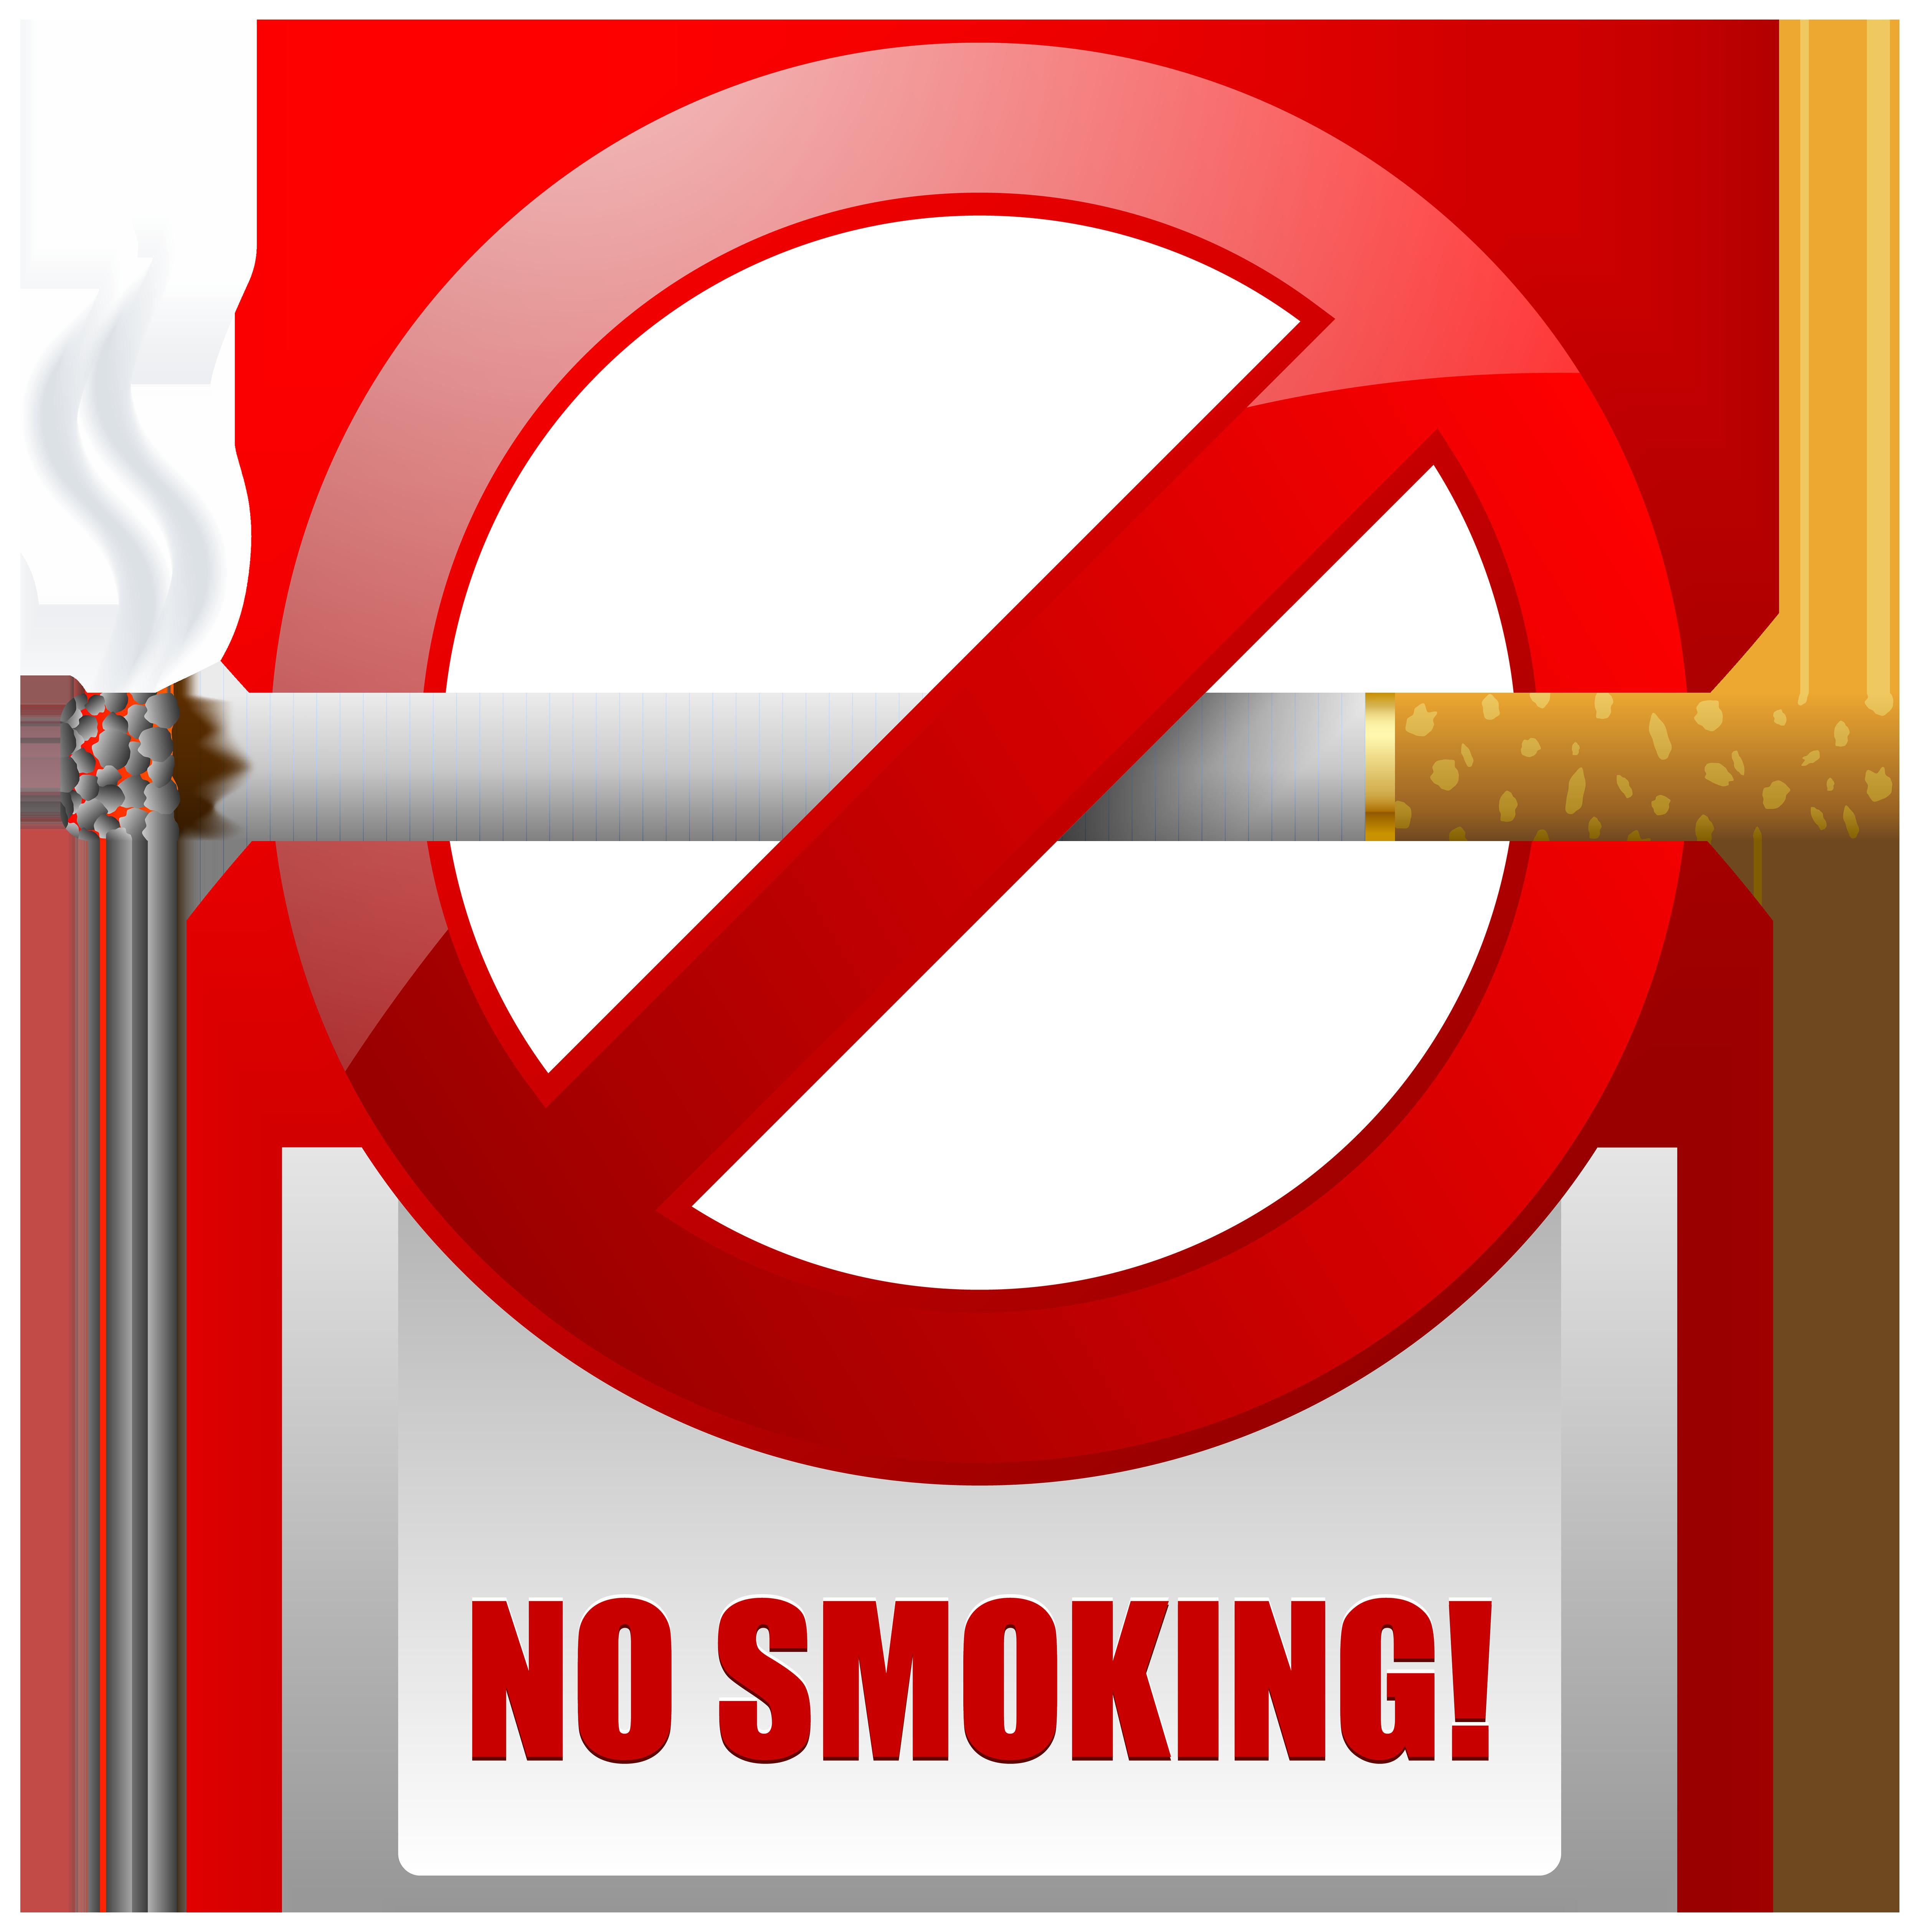 image freeuse download Red no smoking warning. Sign clipart.